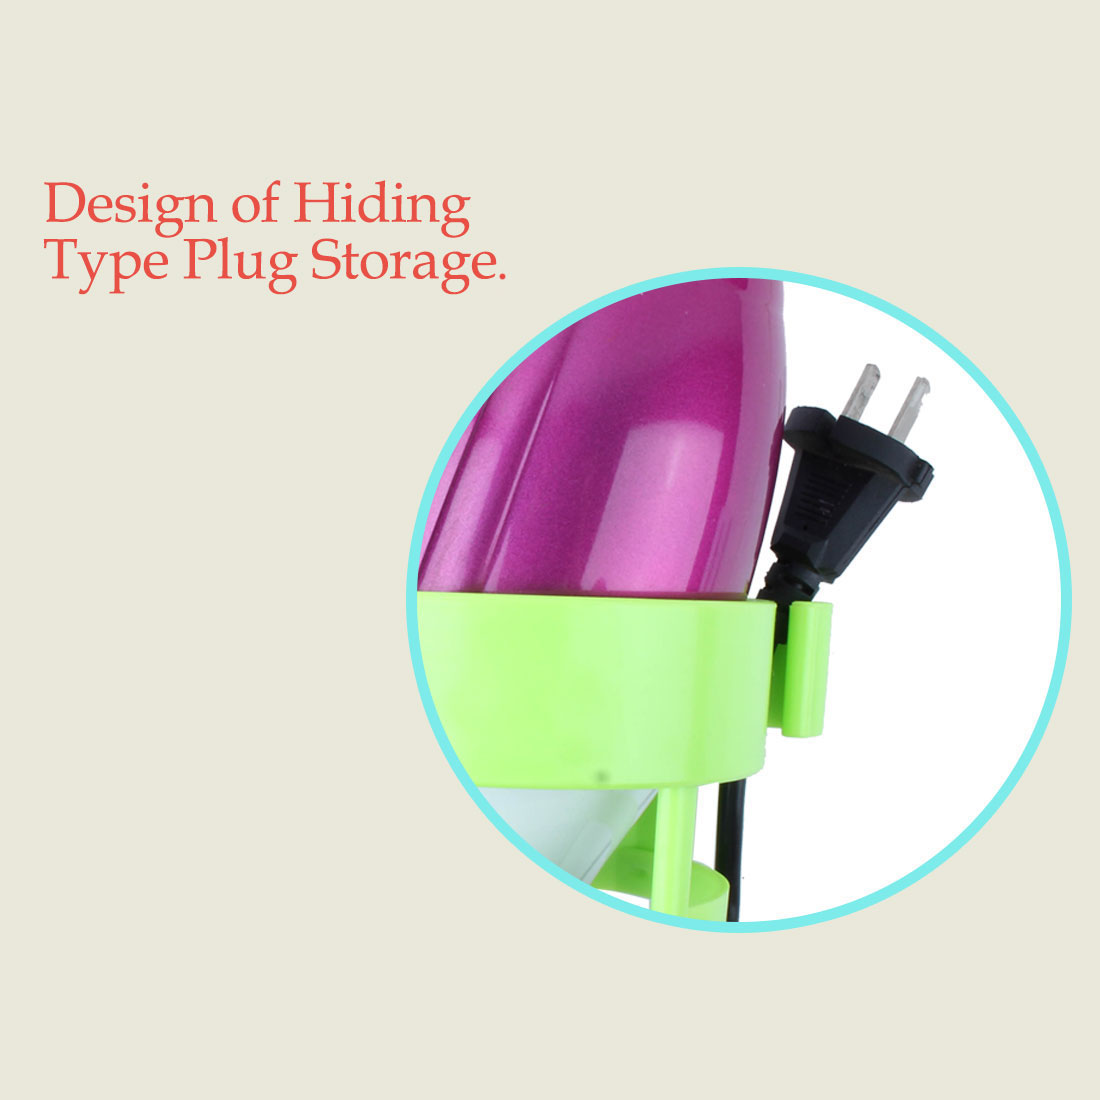 Self Adhesive Plastic Hair Dryer Holder Blower Rack Organizer Bathroom Green - image 3 de 7